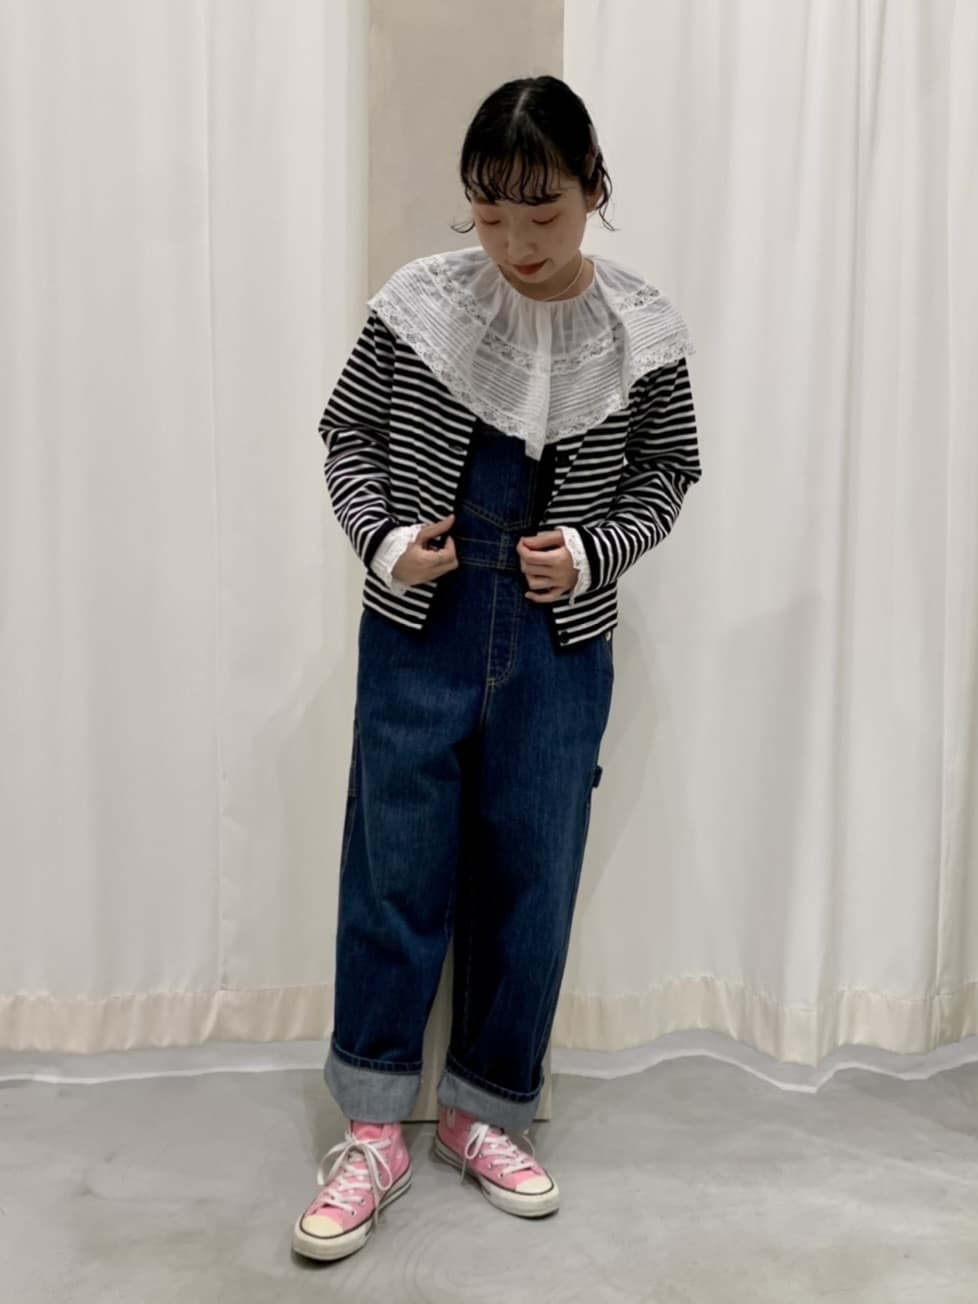 - CHILD WOMAN CHILD WOMAN , PAR ICI ルミネ横浜 身長:157cm 2021.09.09